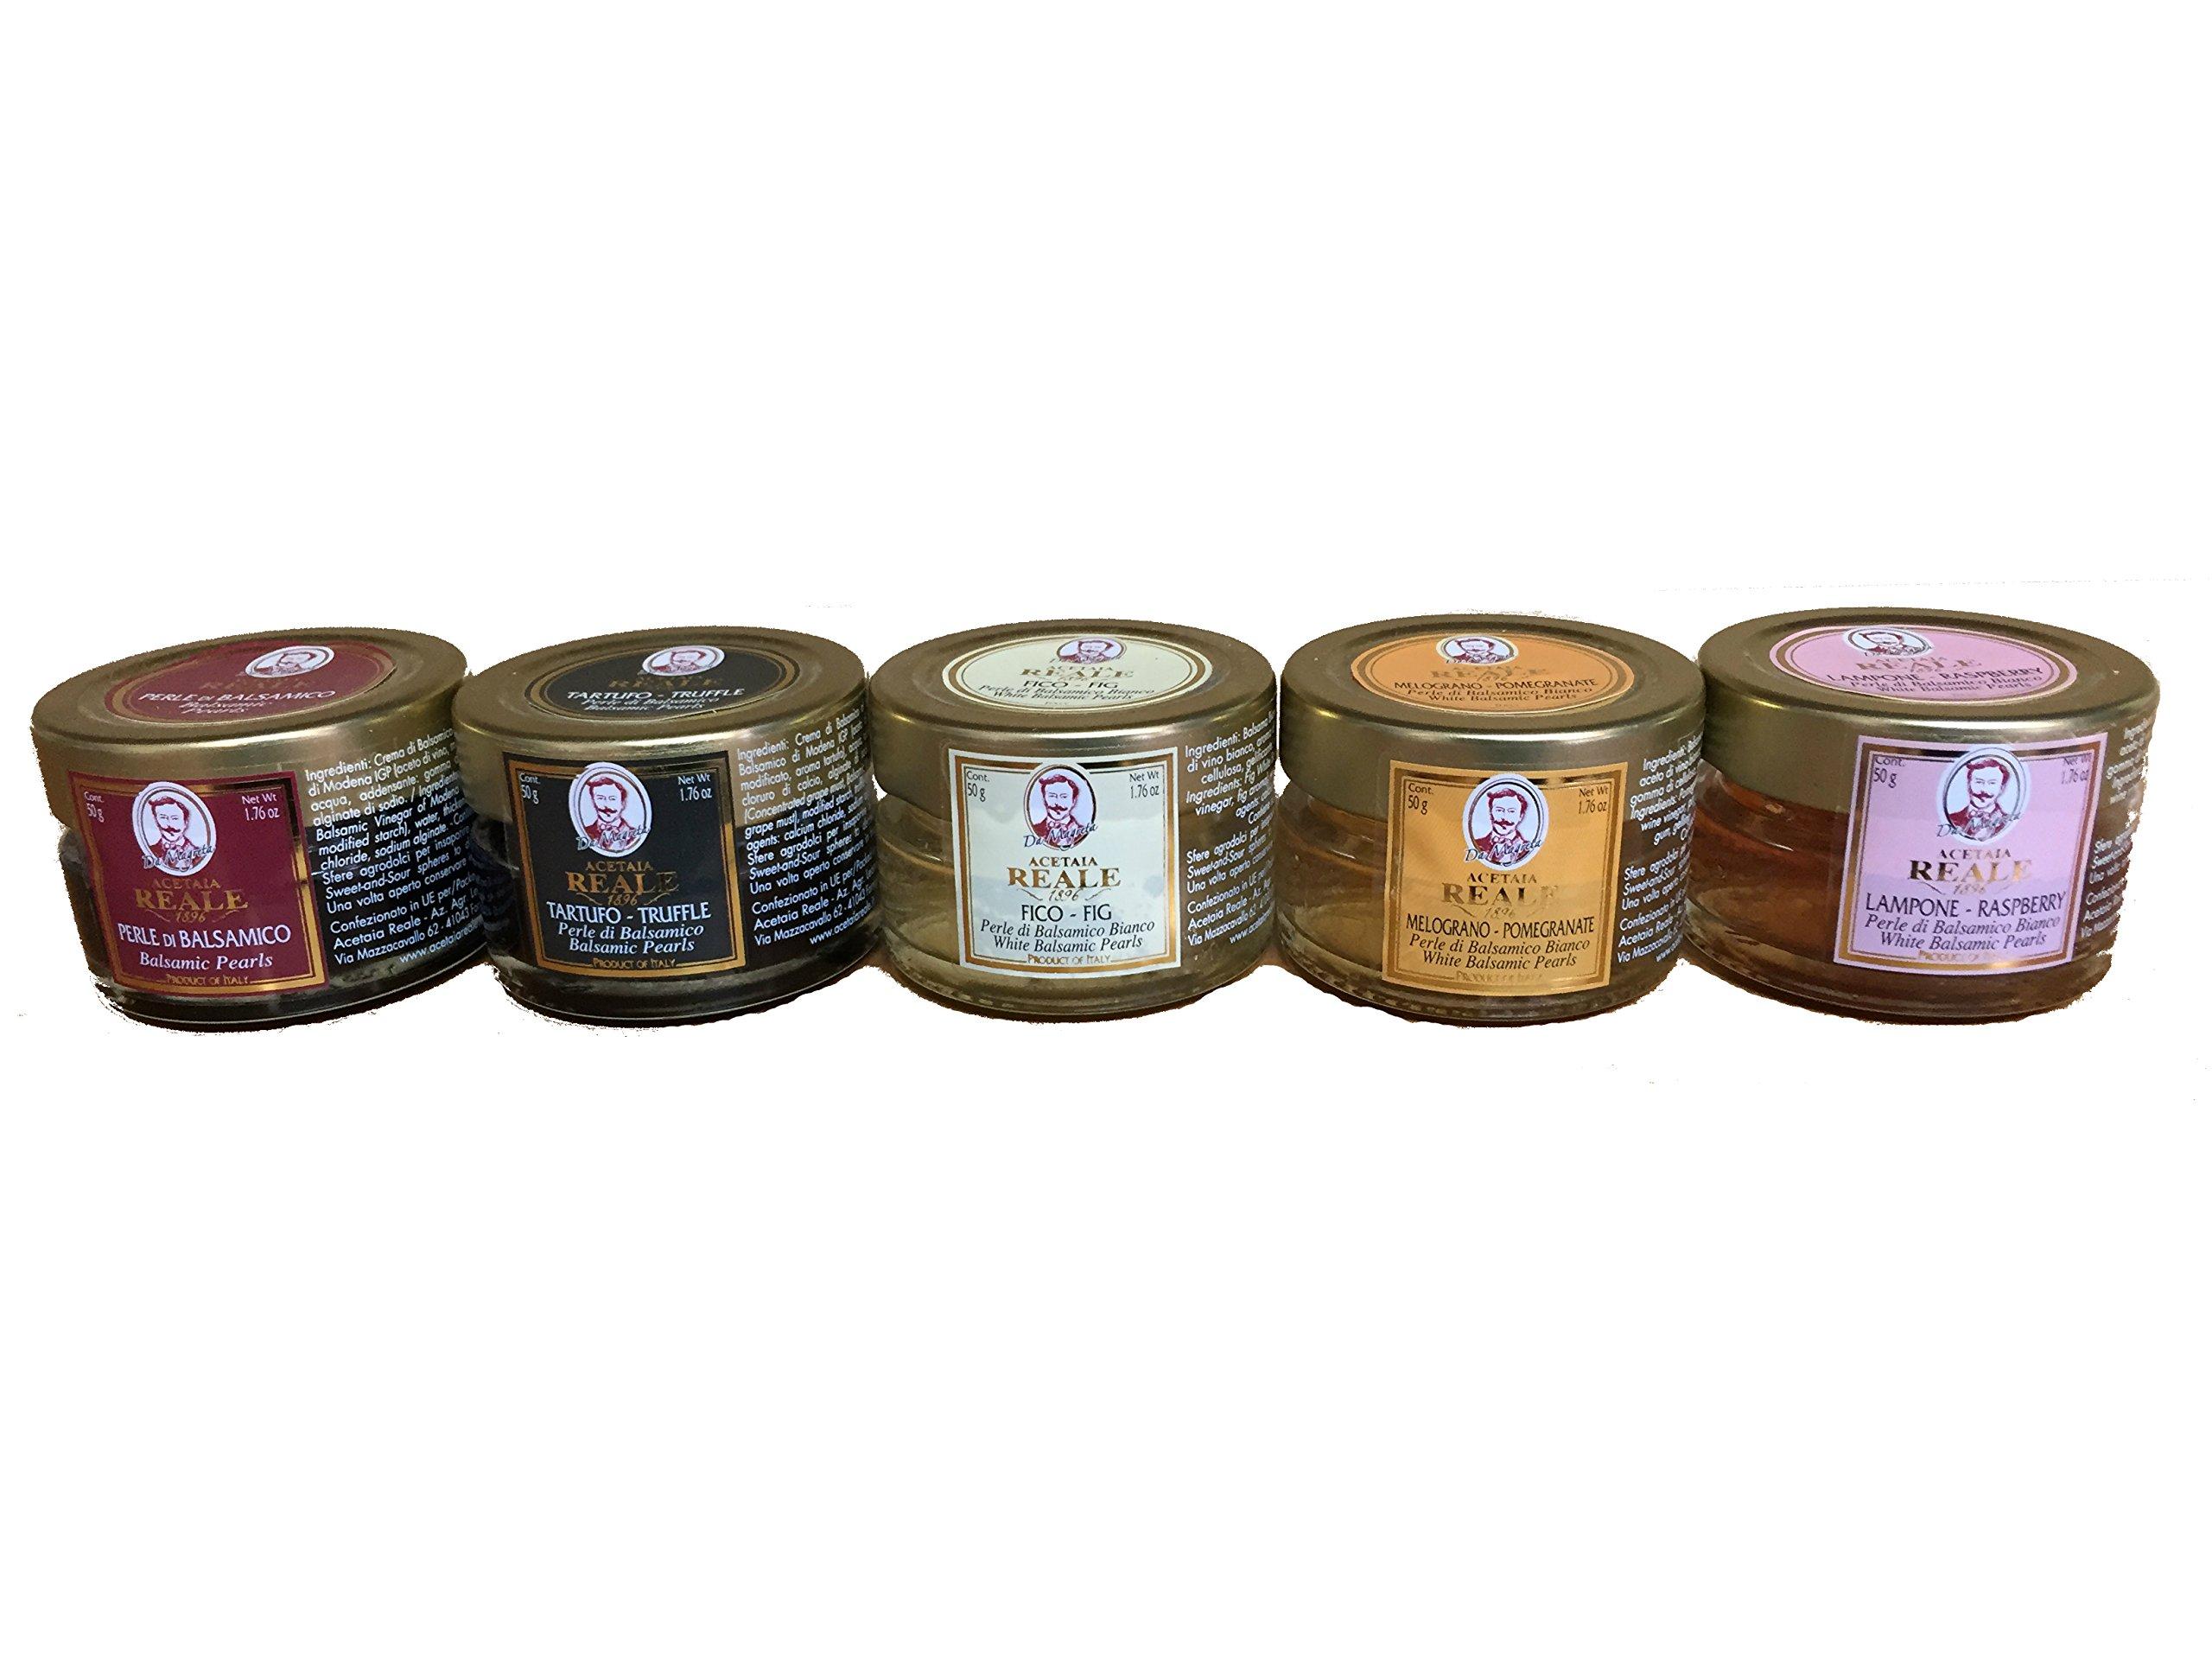 Acetaia Reale - Balsamic Vinegar Pearls Gift Set - 5x50g (Truffle, Fig, Pomegranate, Raspberry)